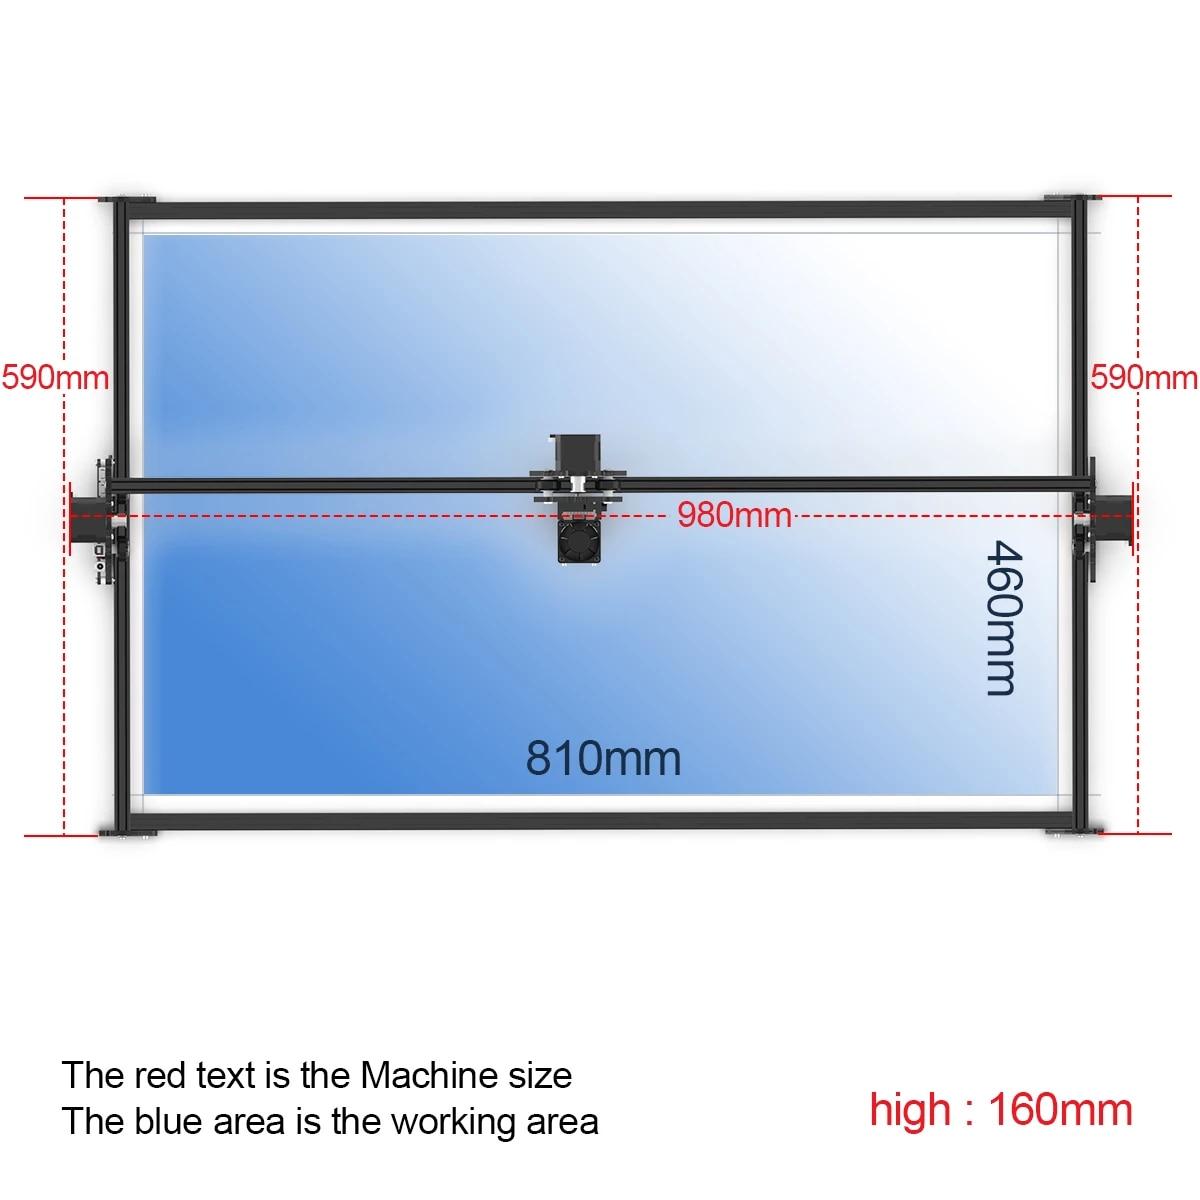 NEJE Max 80W High Speed Laser Engraving Machine Lightburn App Control CNC Laser Cutter Engraver Material for Wood/Metal/Leather enlarge